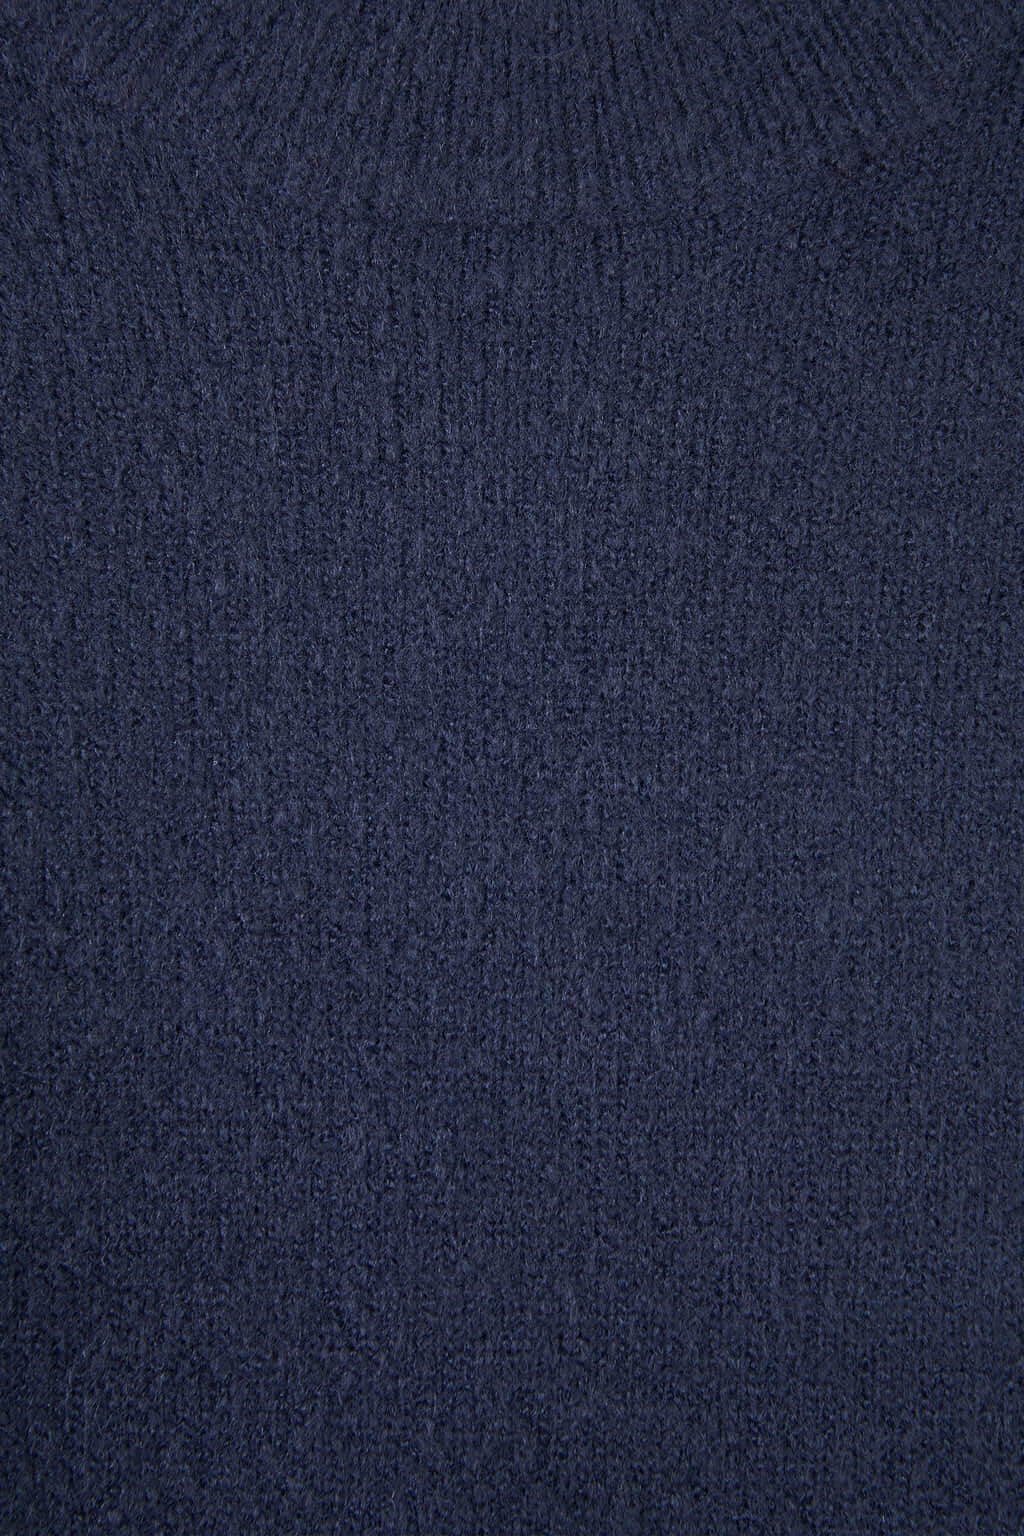 Sweater 2675 Navy 6